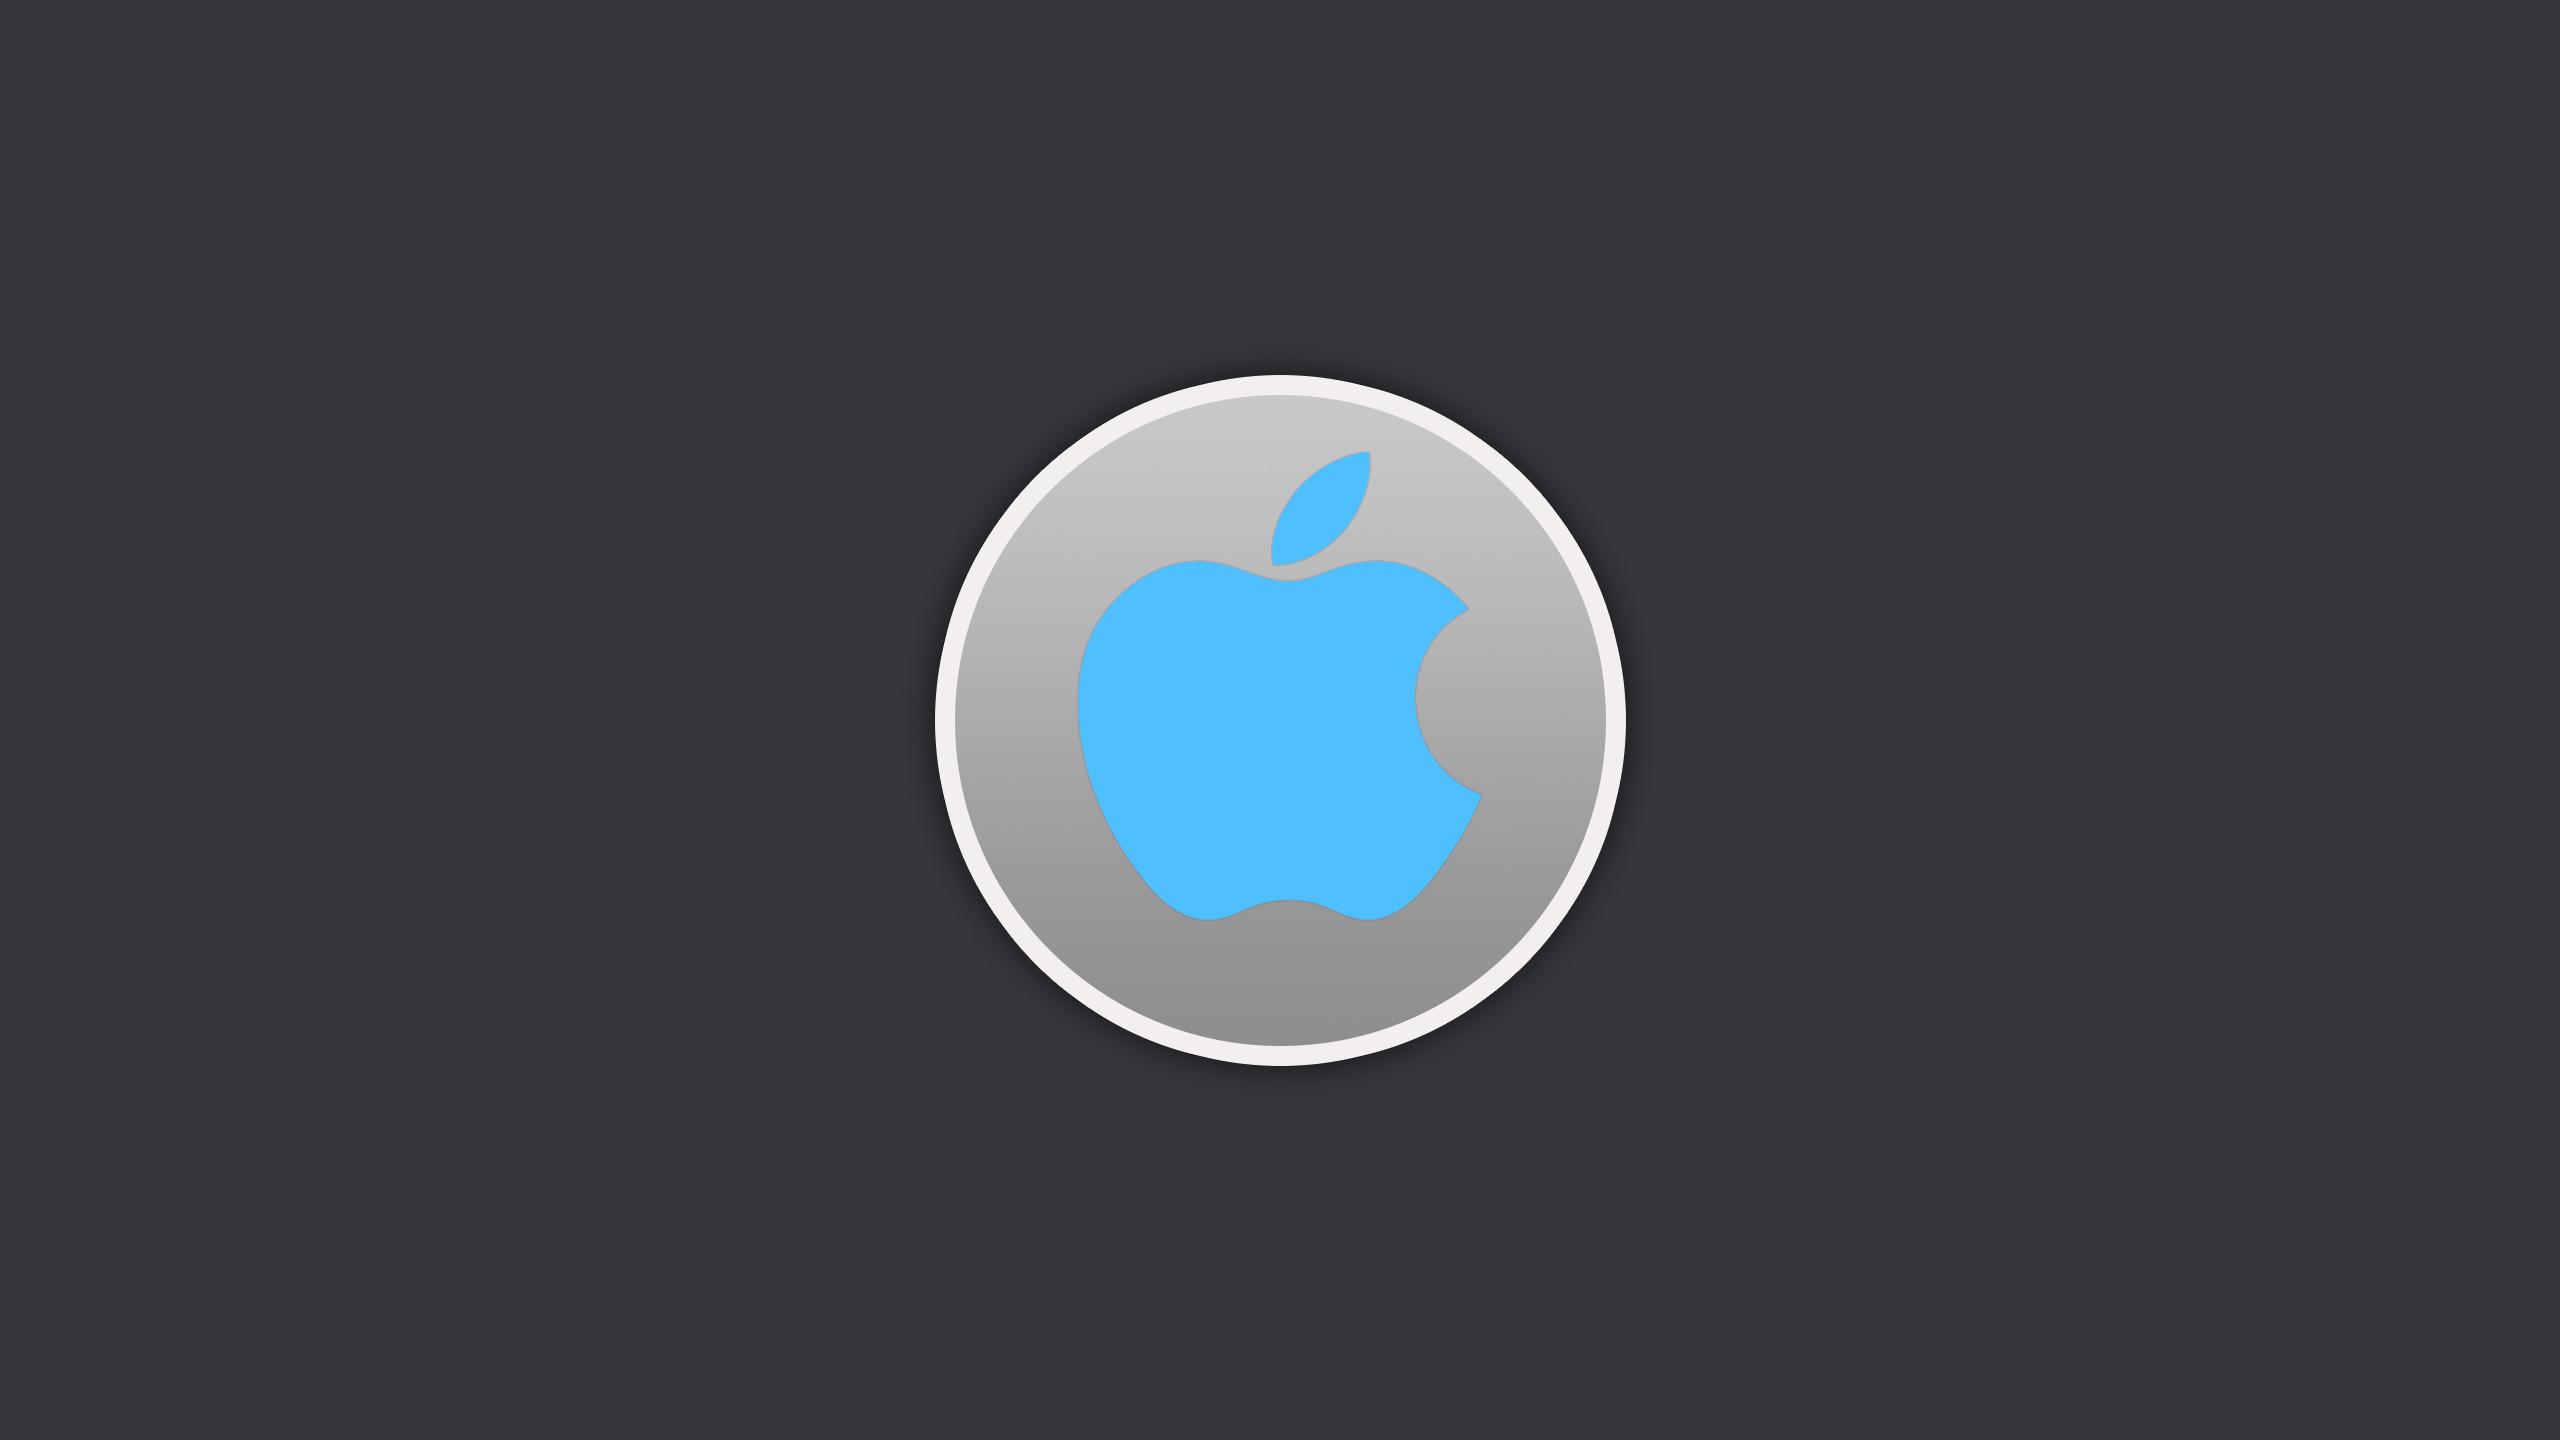 Apple Circle Wallpaper Blue by howiedi2 Apple Circle Wallpaper Blue by  howiedi2